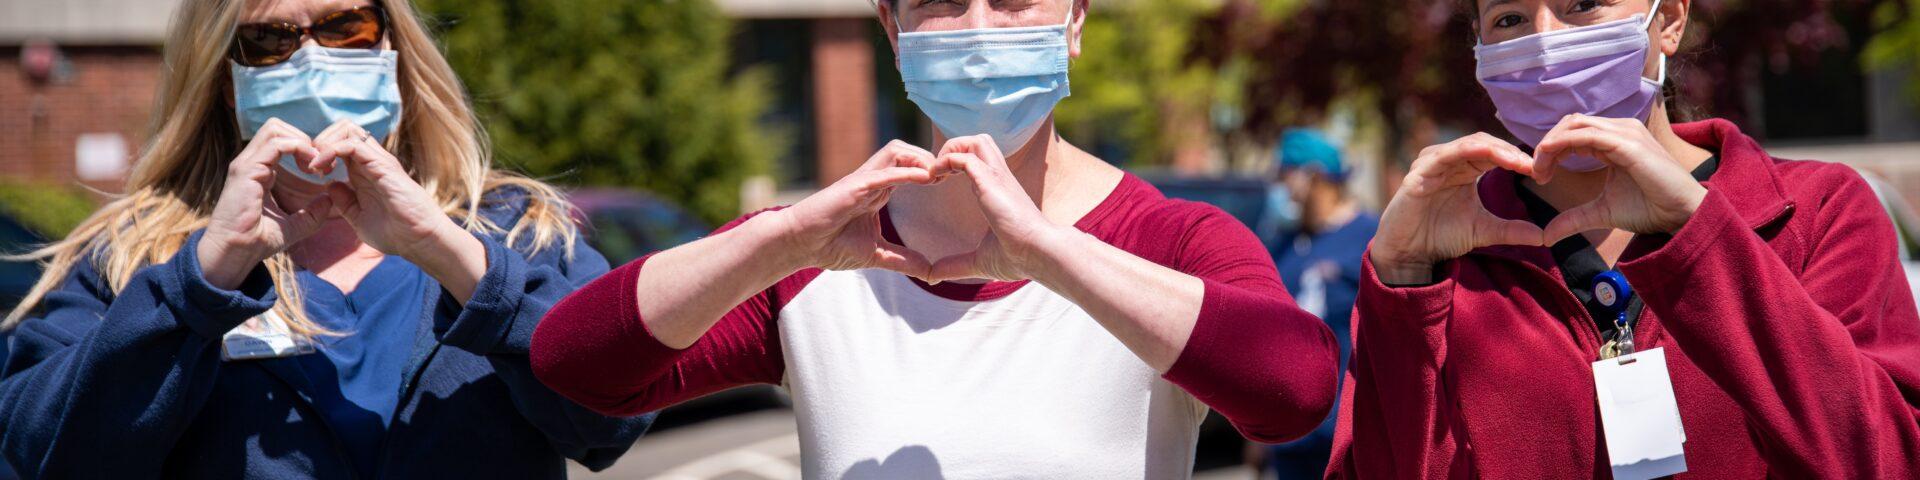 nurses in masks